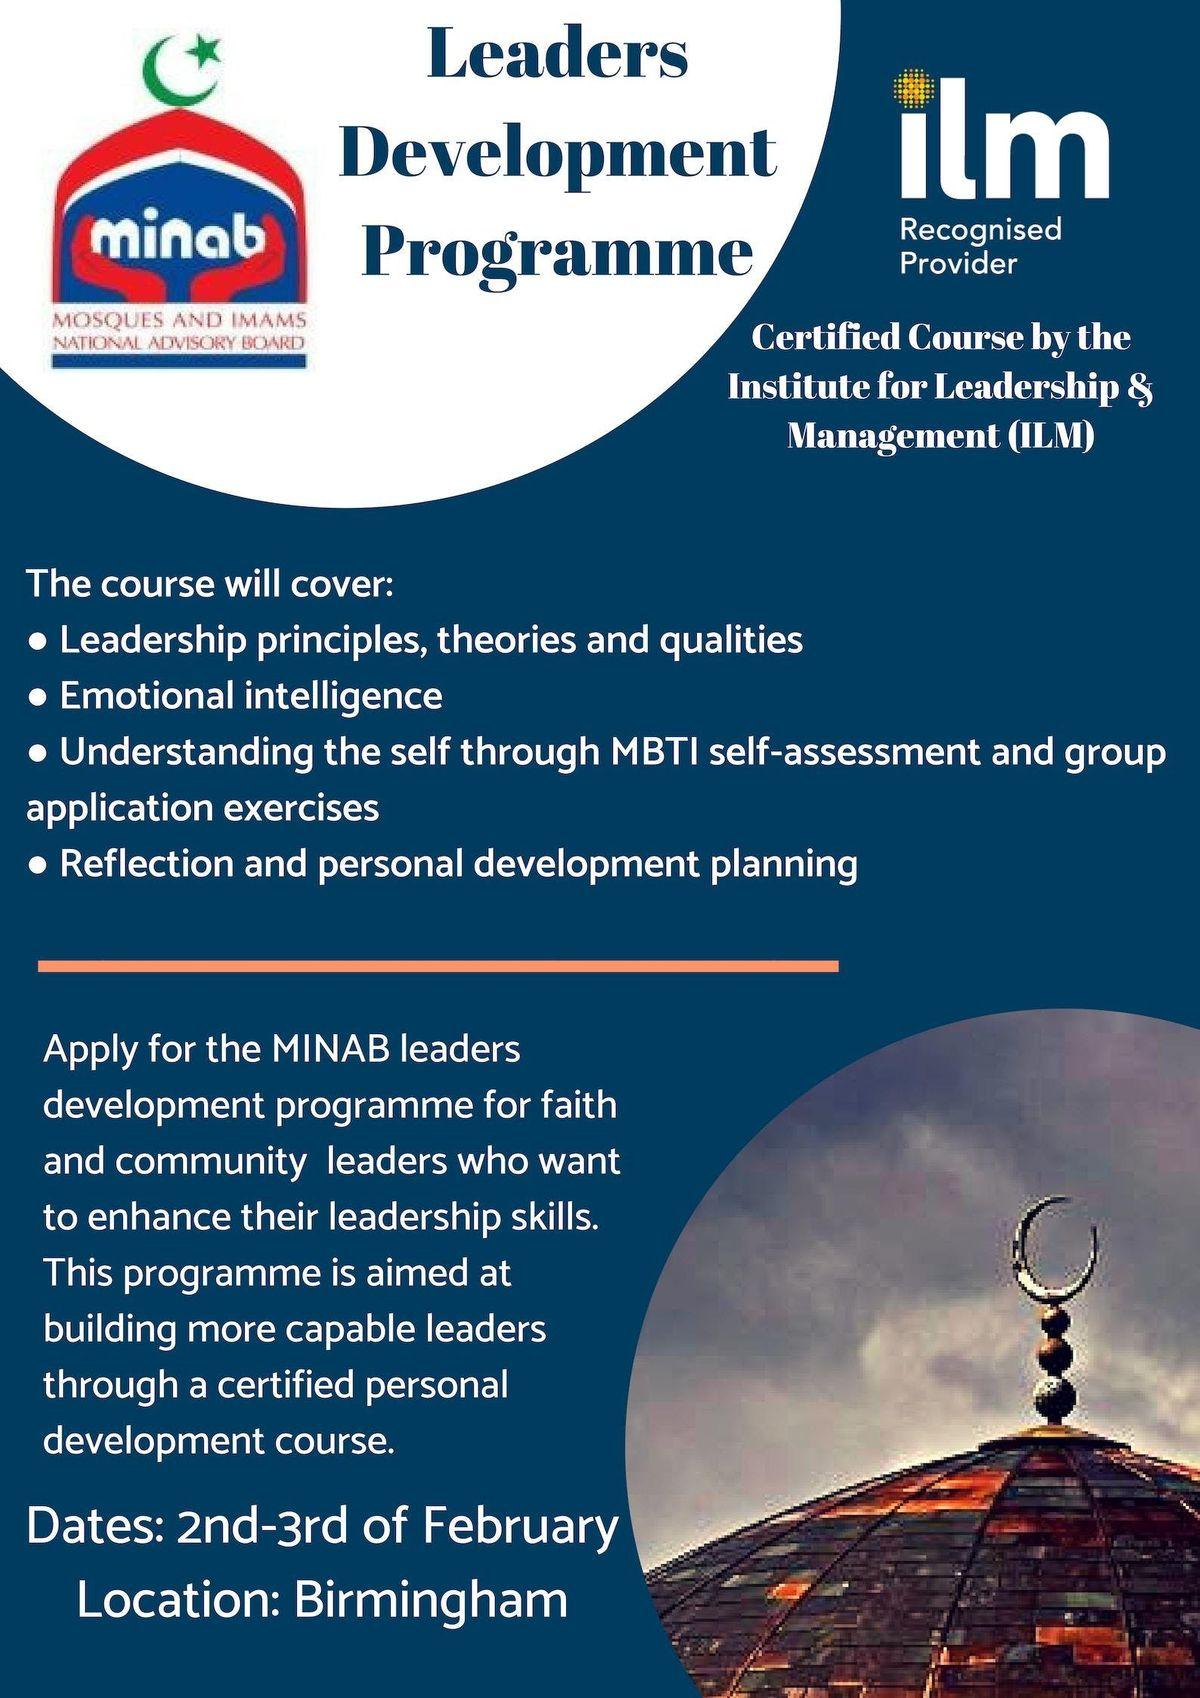 MINAB Leadership Development Programme in Manchester